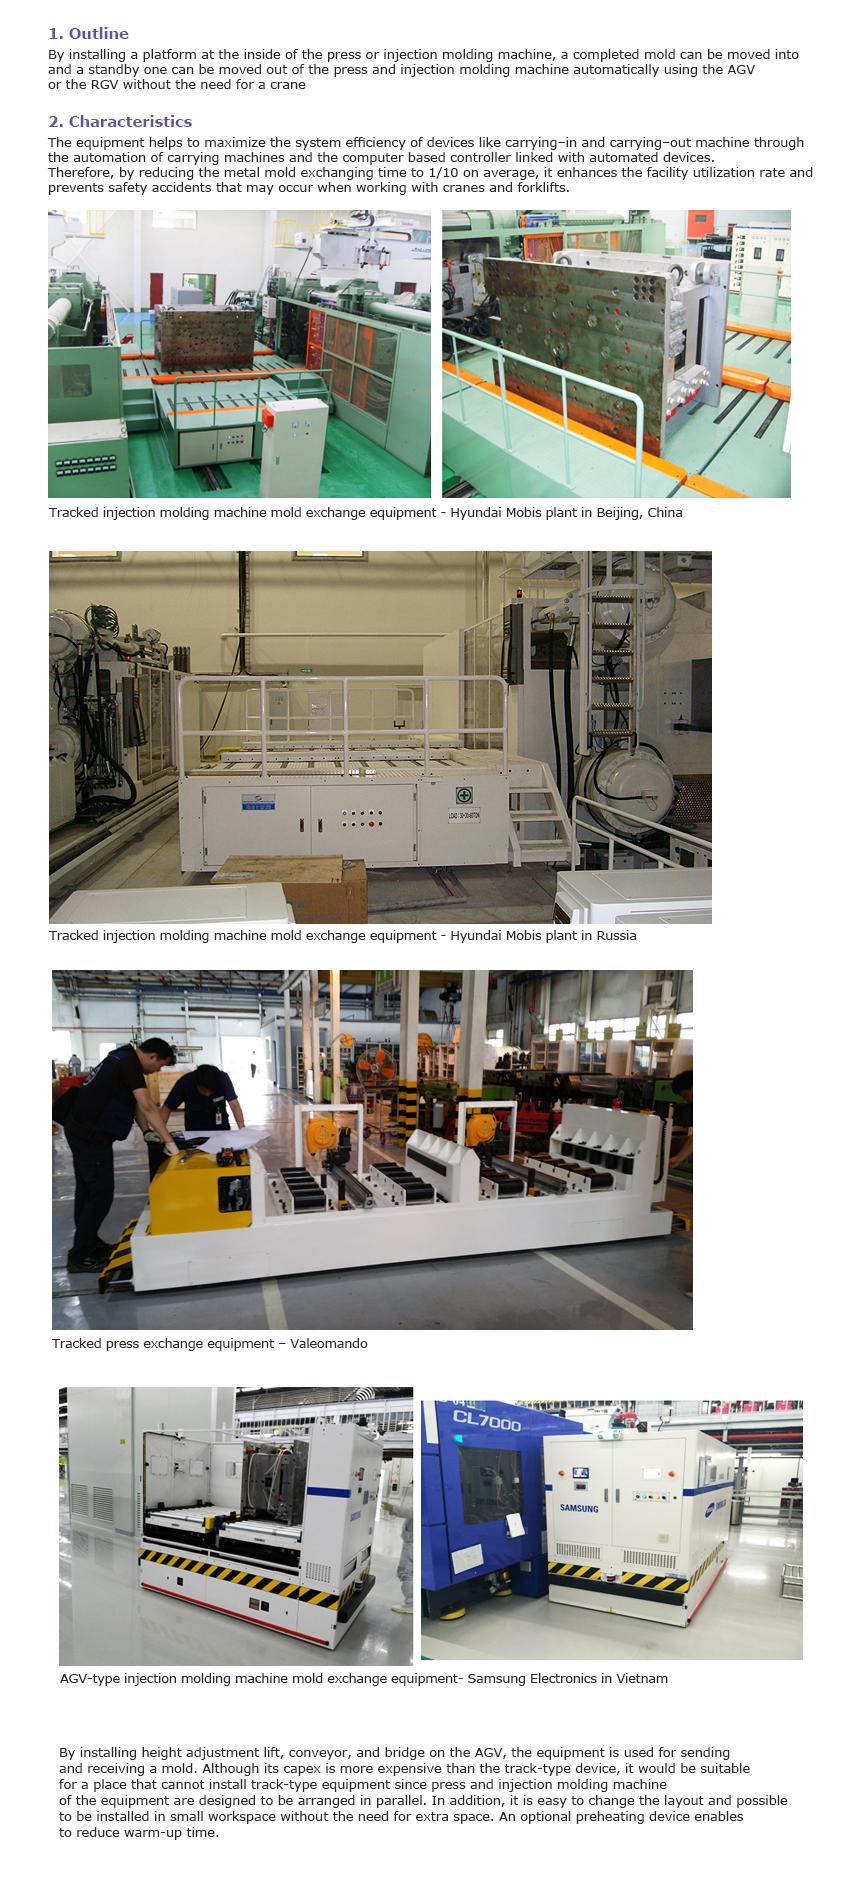 HAN SUNG WELL TECH Mold Exchange Equipment